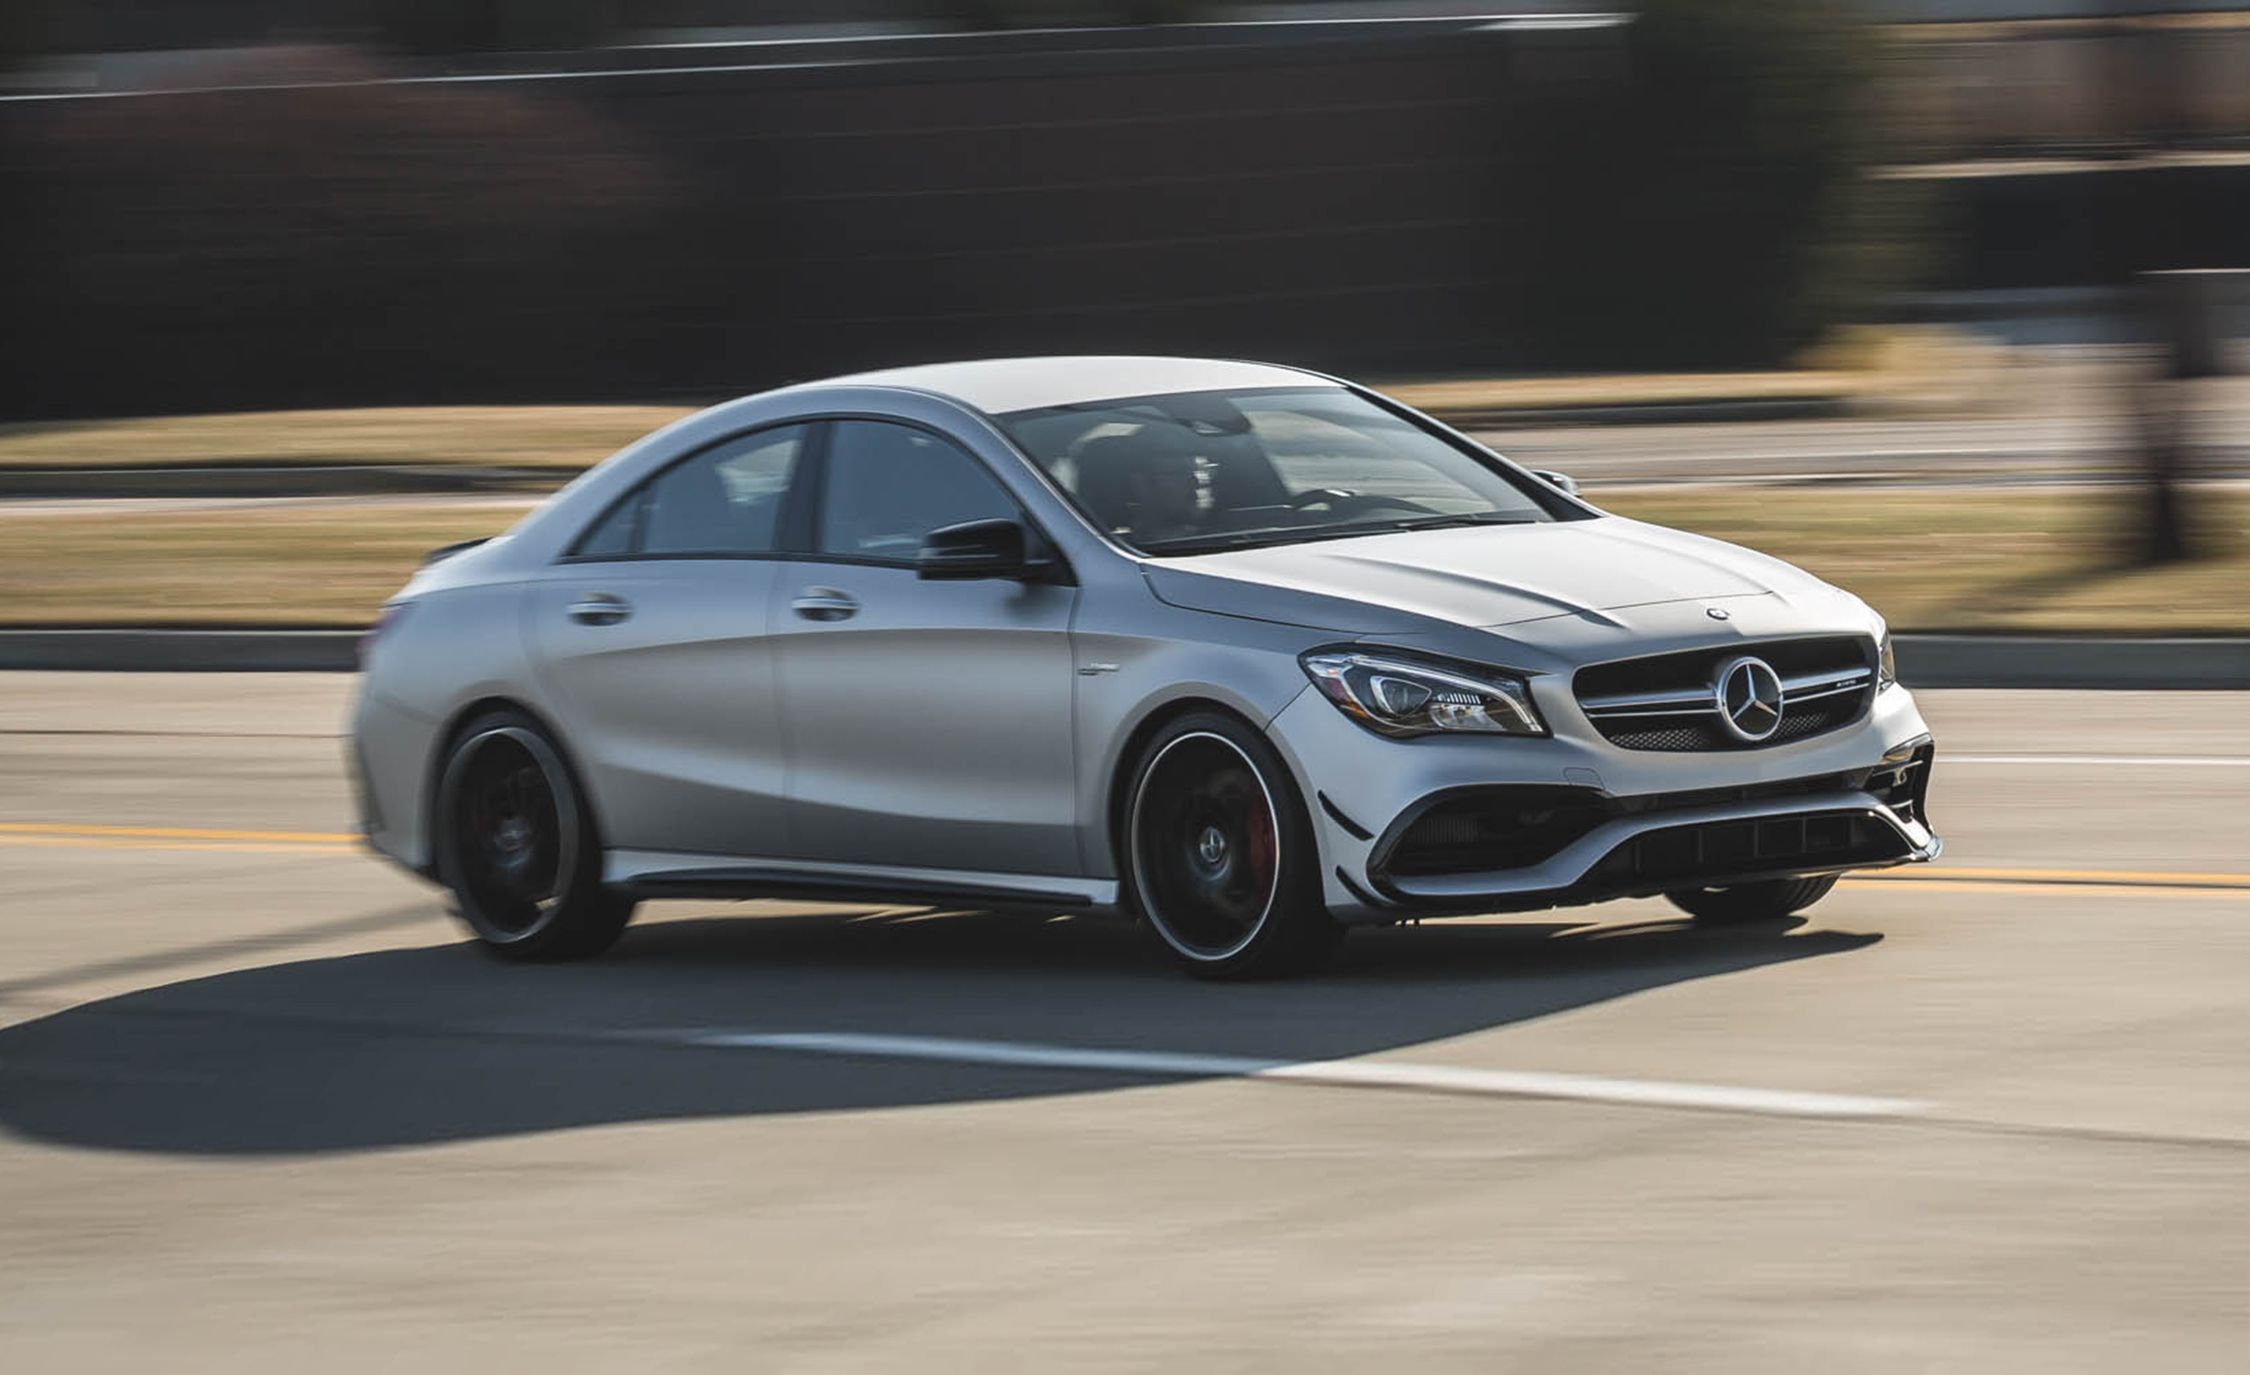 2018 Mercedes-AMG CLA45